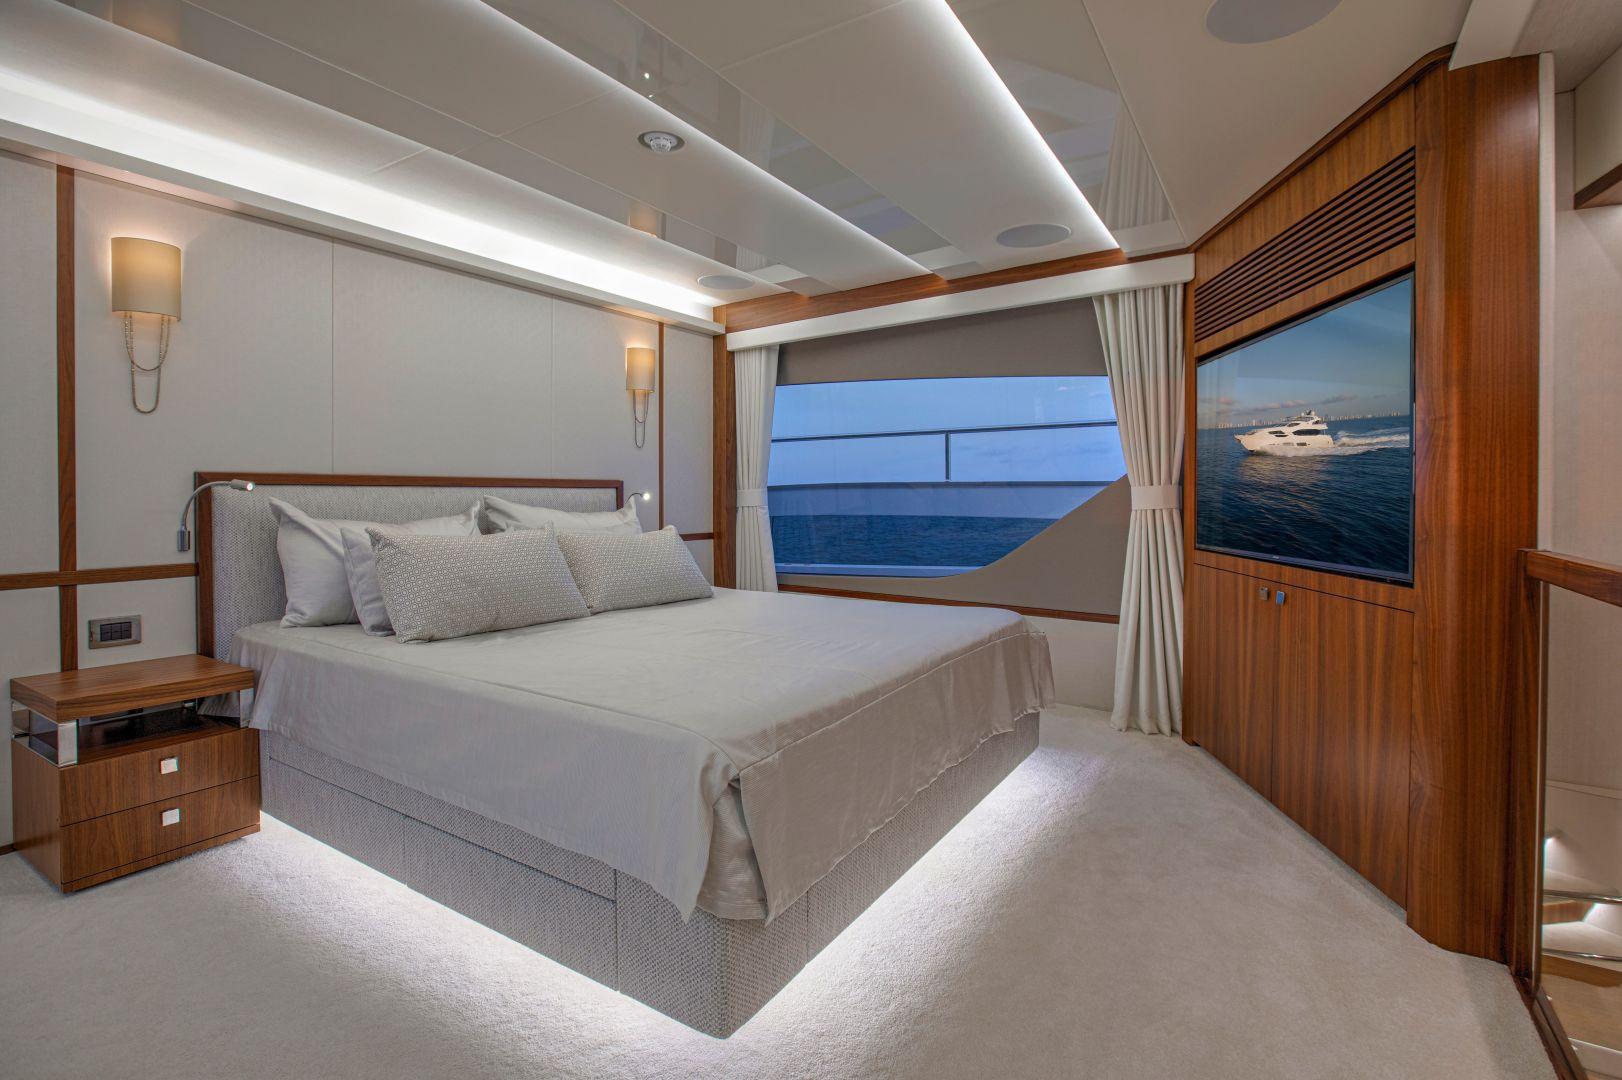 Sunseeker-95 Yacht 2017-Perseverance 3 Ft Lauderdale-Florida-United States-1400092   Thumbnail